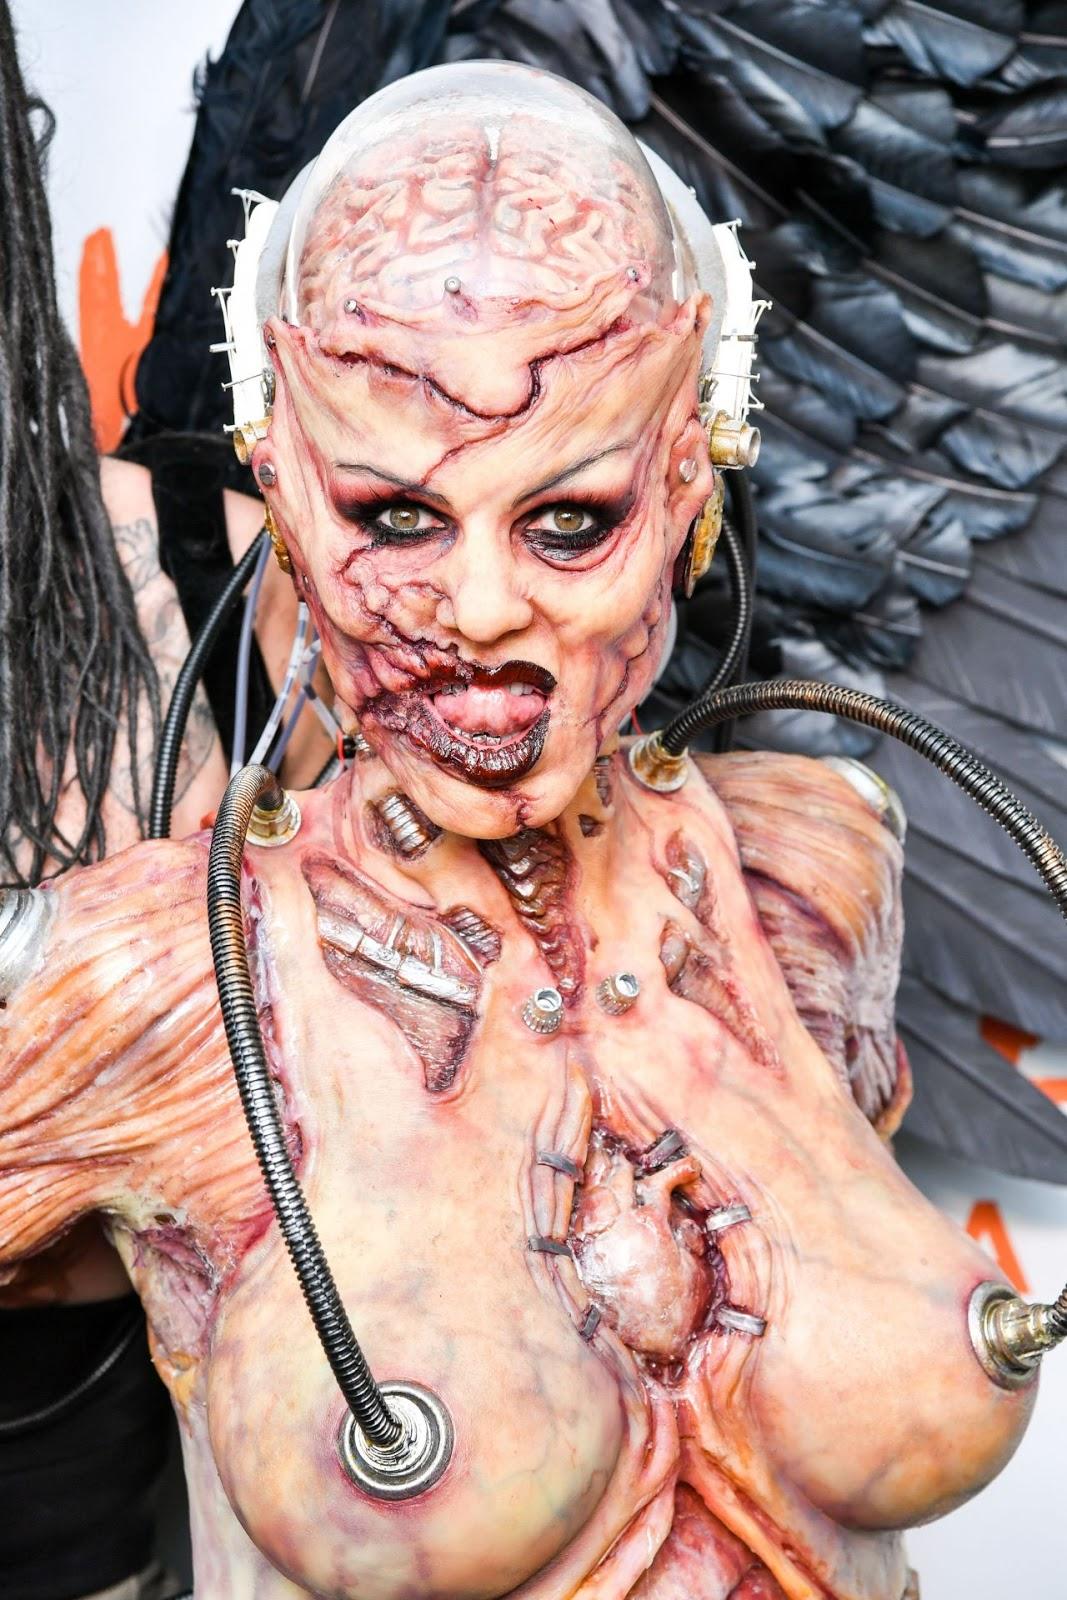 Heidi Klum – Heidi Klum's 20th Annual Halloween Party in NY